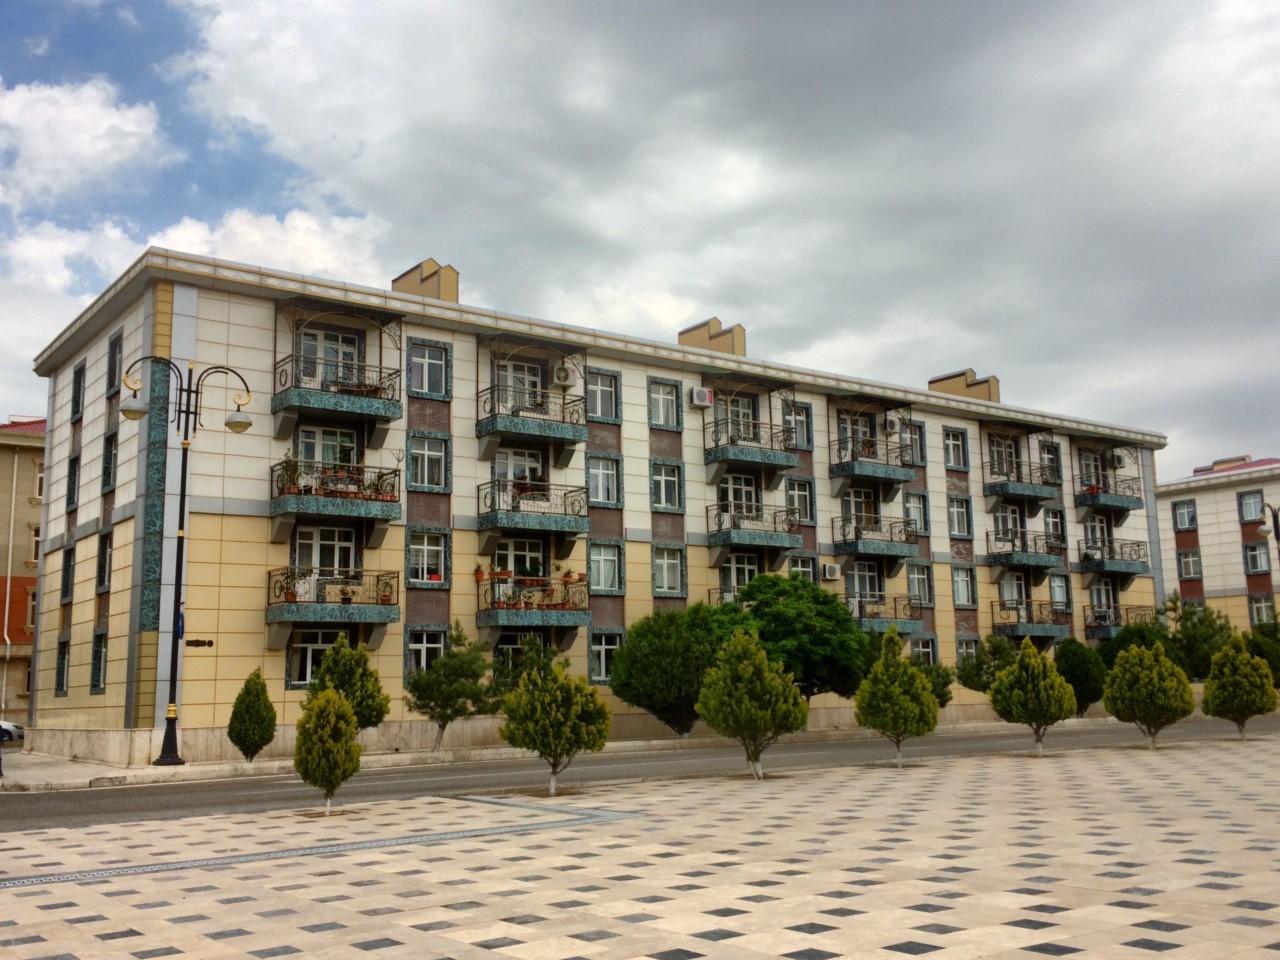 Another nice building in Nakhchivan